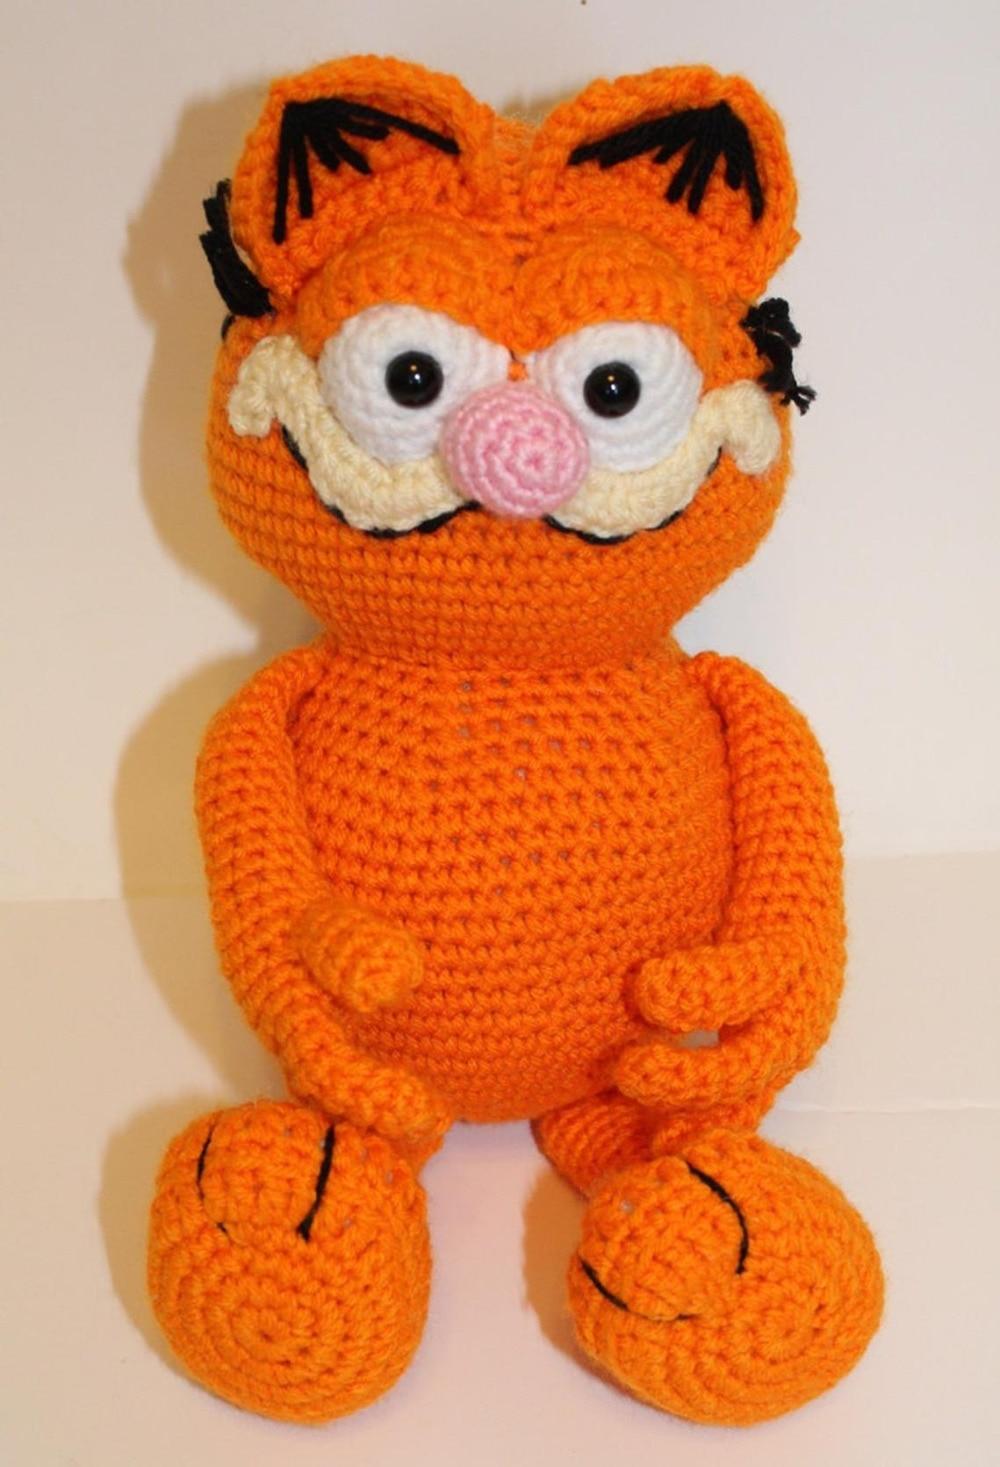 crochet toys  amigurumi cat  model    number  w491crochet toys  amigurumi cat  model    number  w491